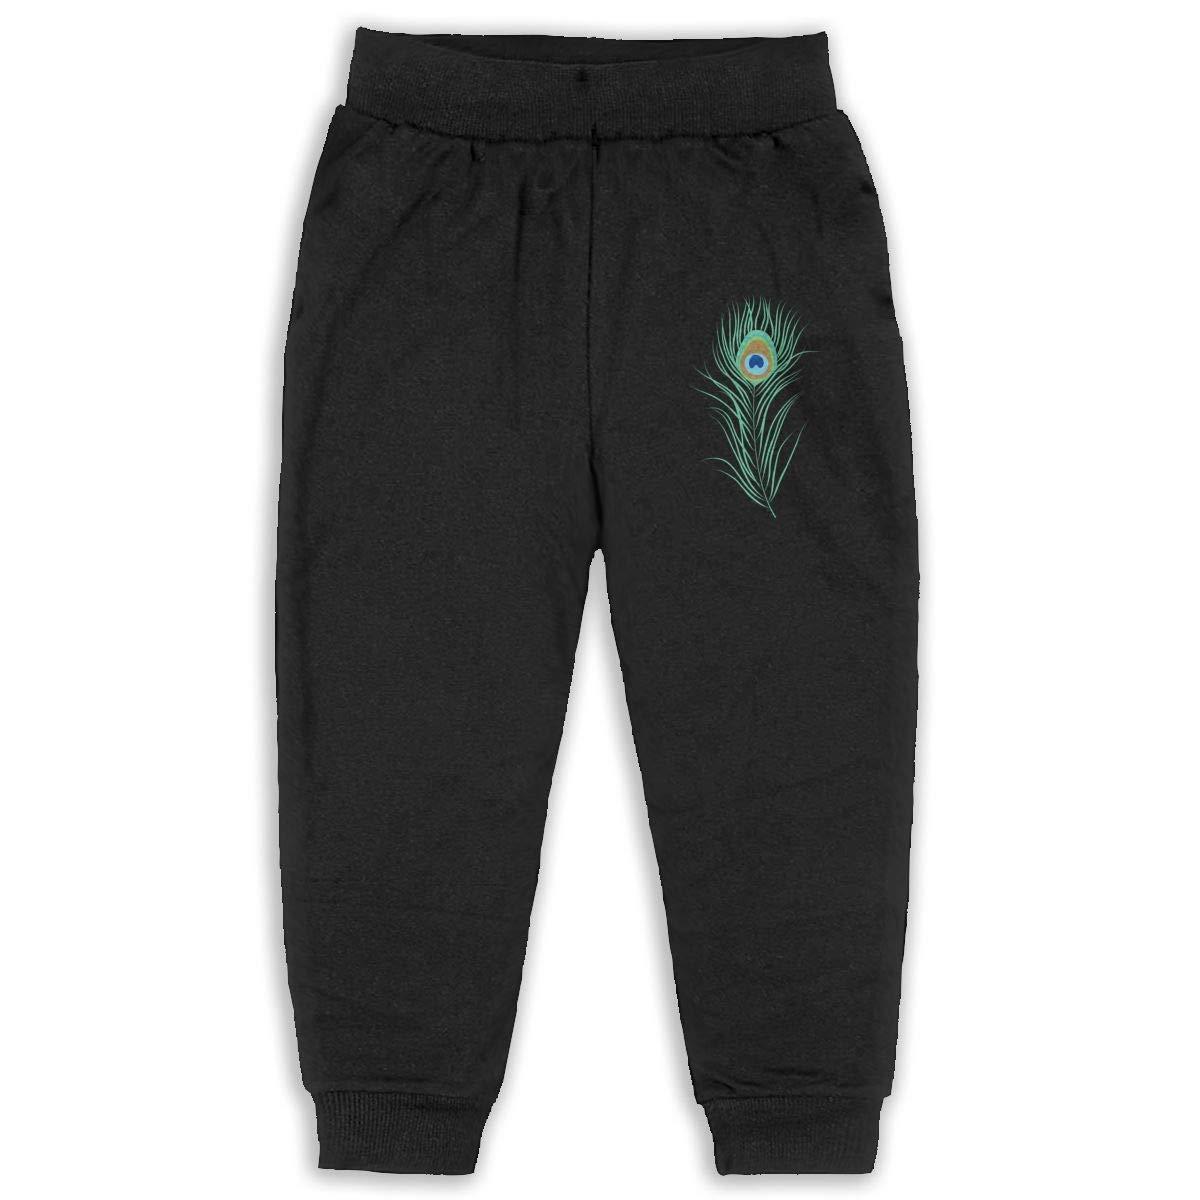 EASON-G Kids Joggers Peacock Feather Fashion Sweatpants 2T 6T